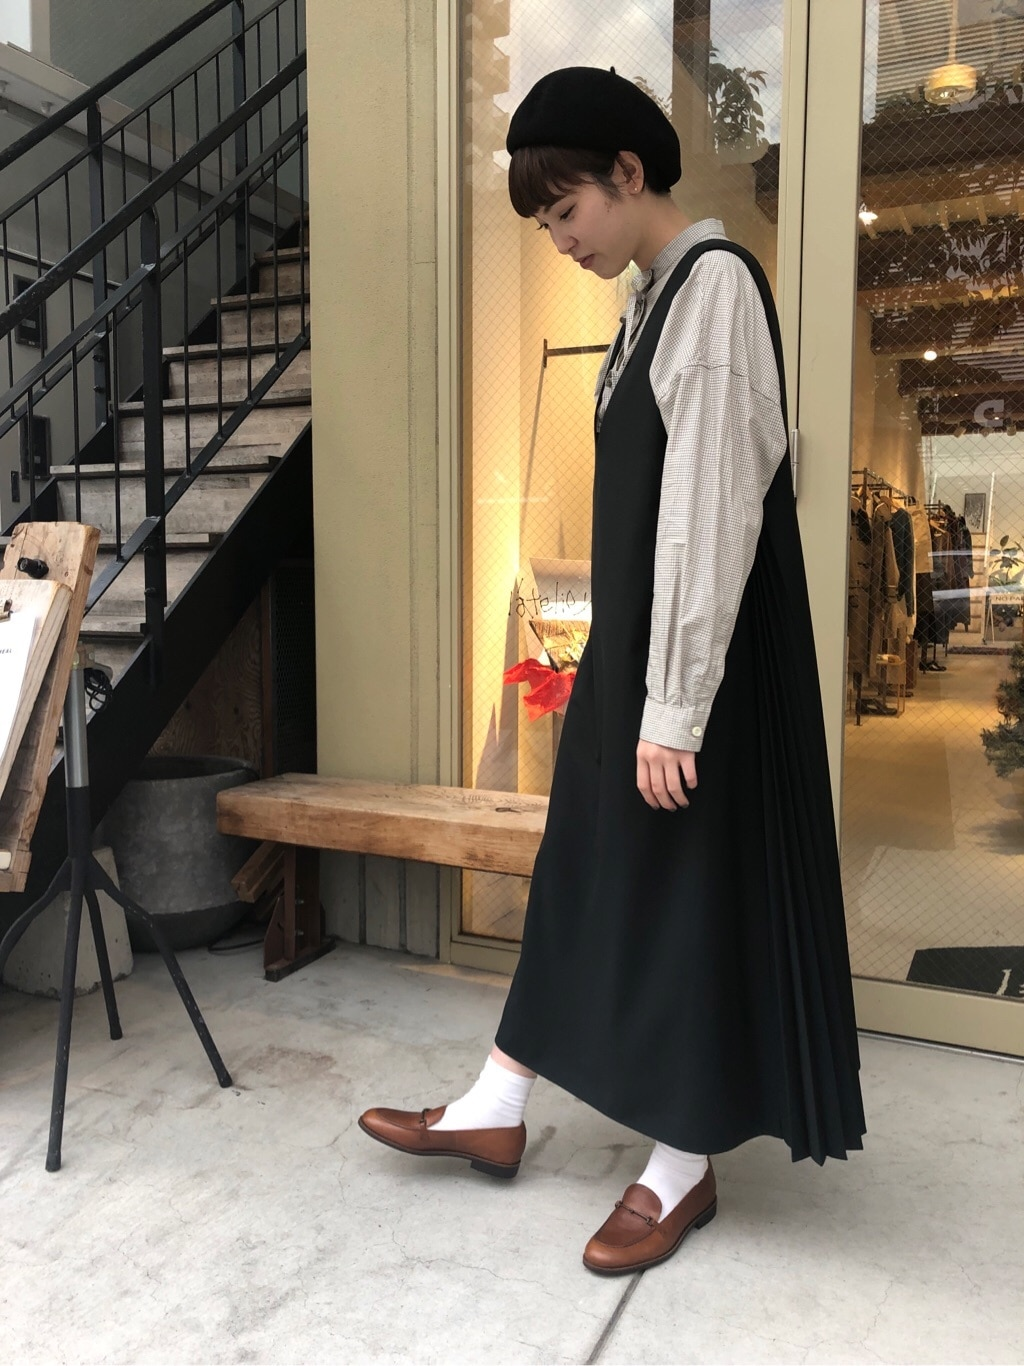 l'atelier du savon 名古屋栄路面 身長:161cm 2019.12.22